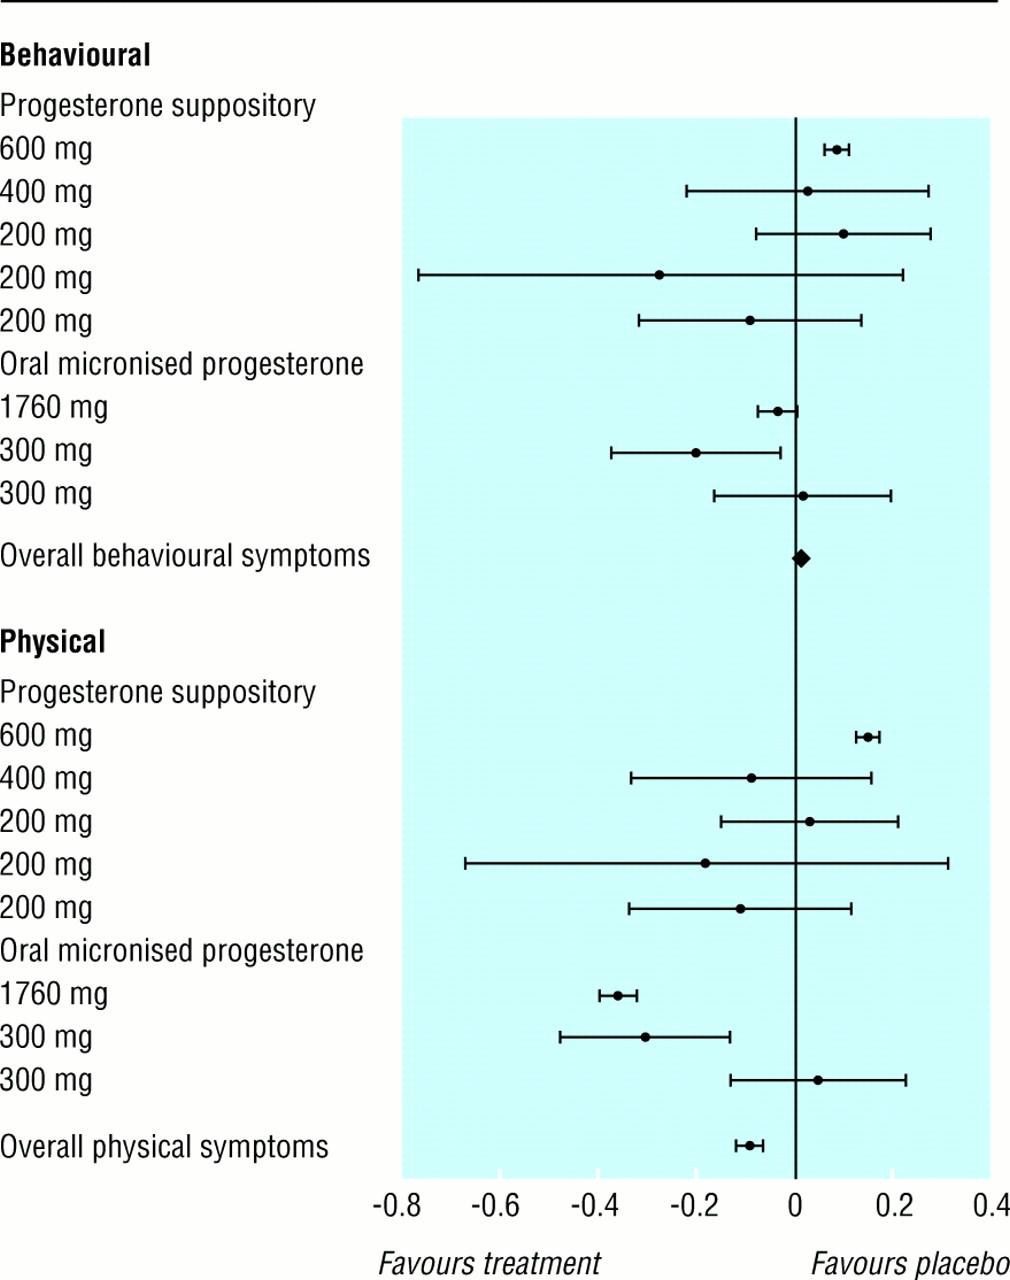 management of premenstrual syndrome pdf